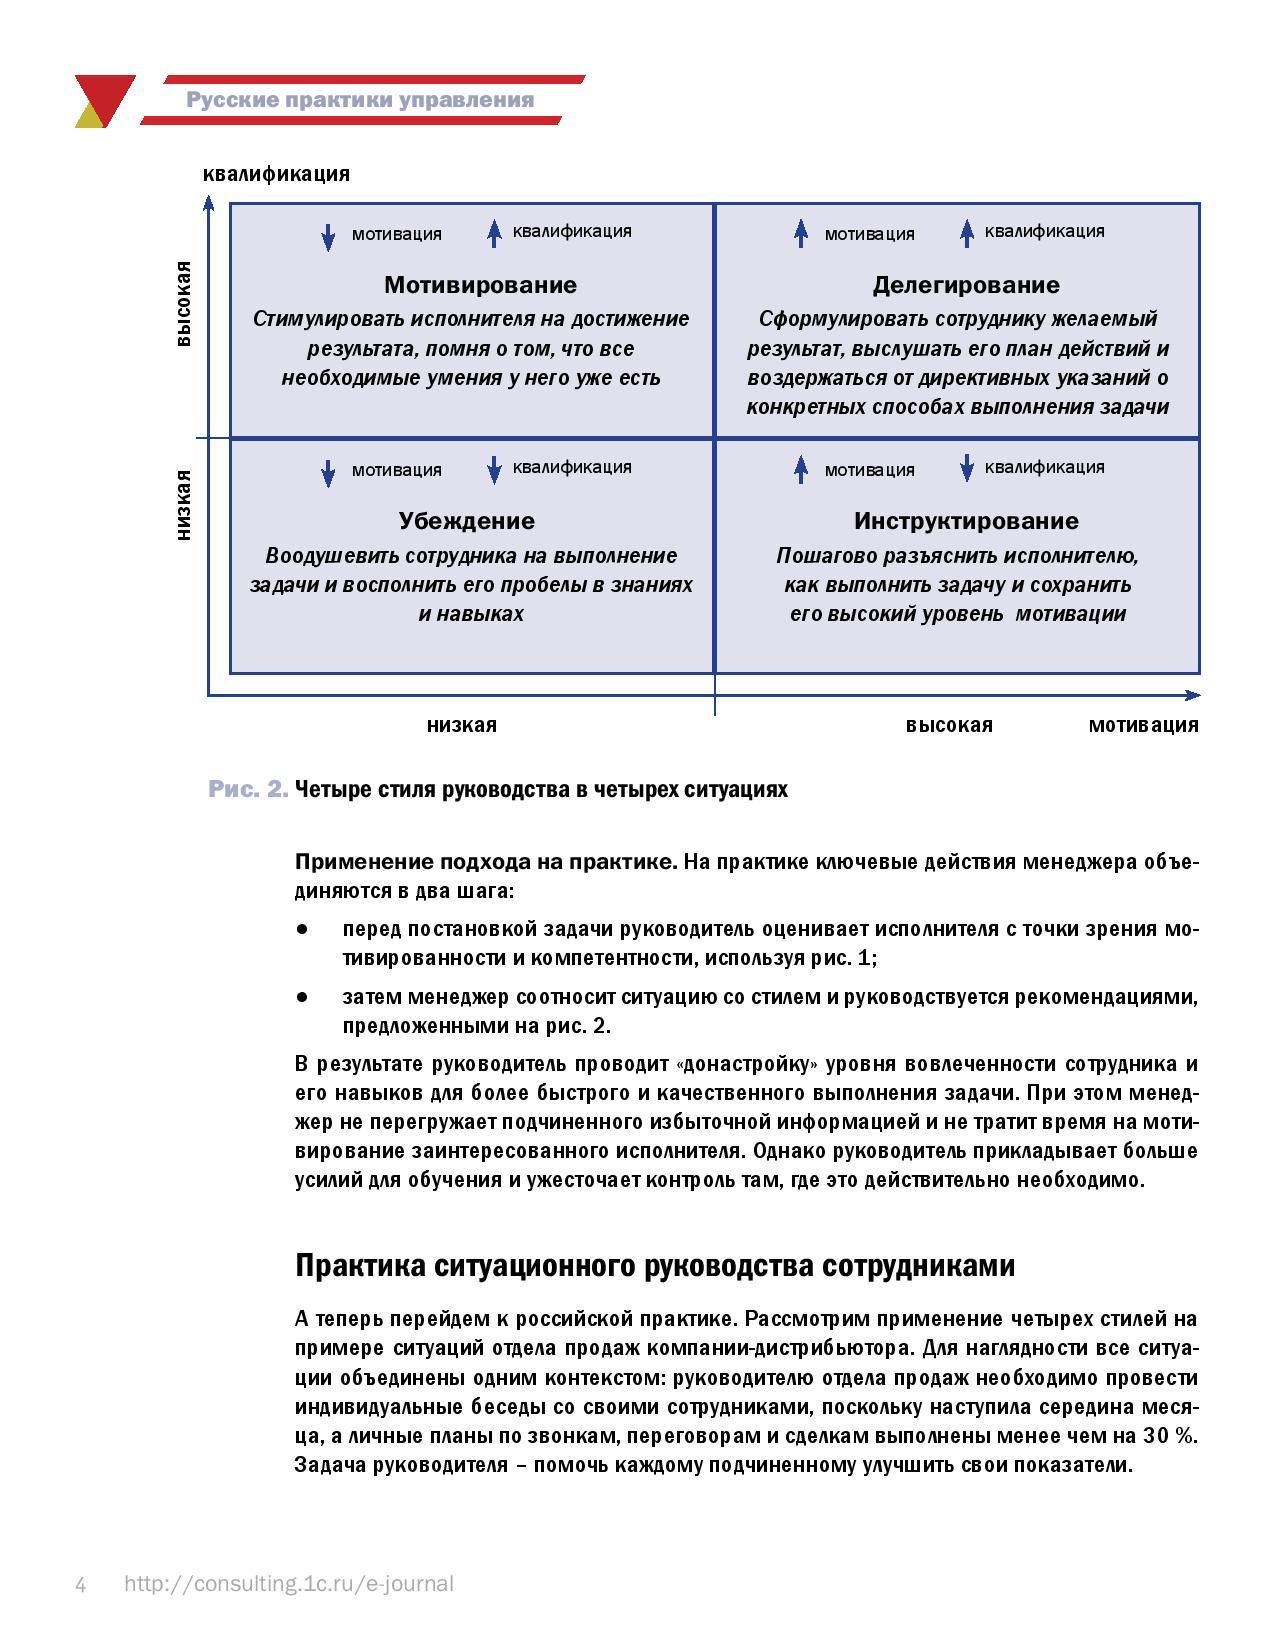 Situacionnyy_podhod_Cast__1._Upravlaem_predpriatiem__04_2015-page-004